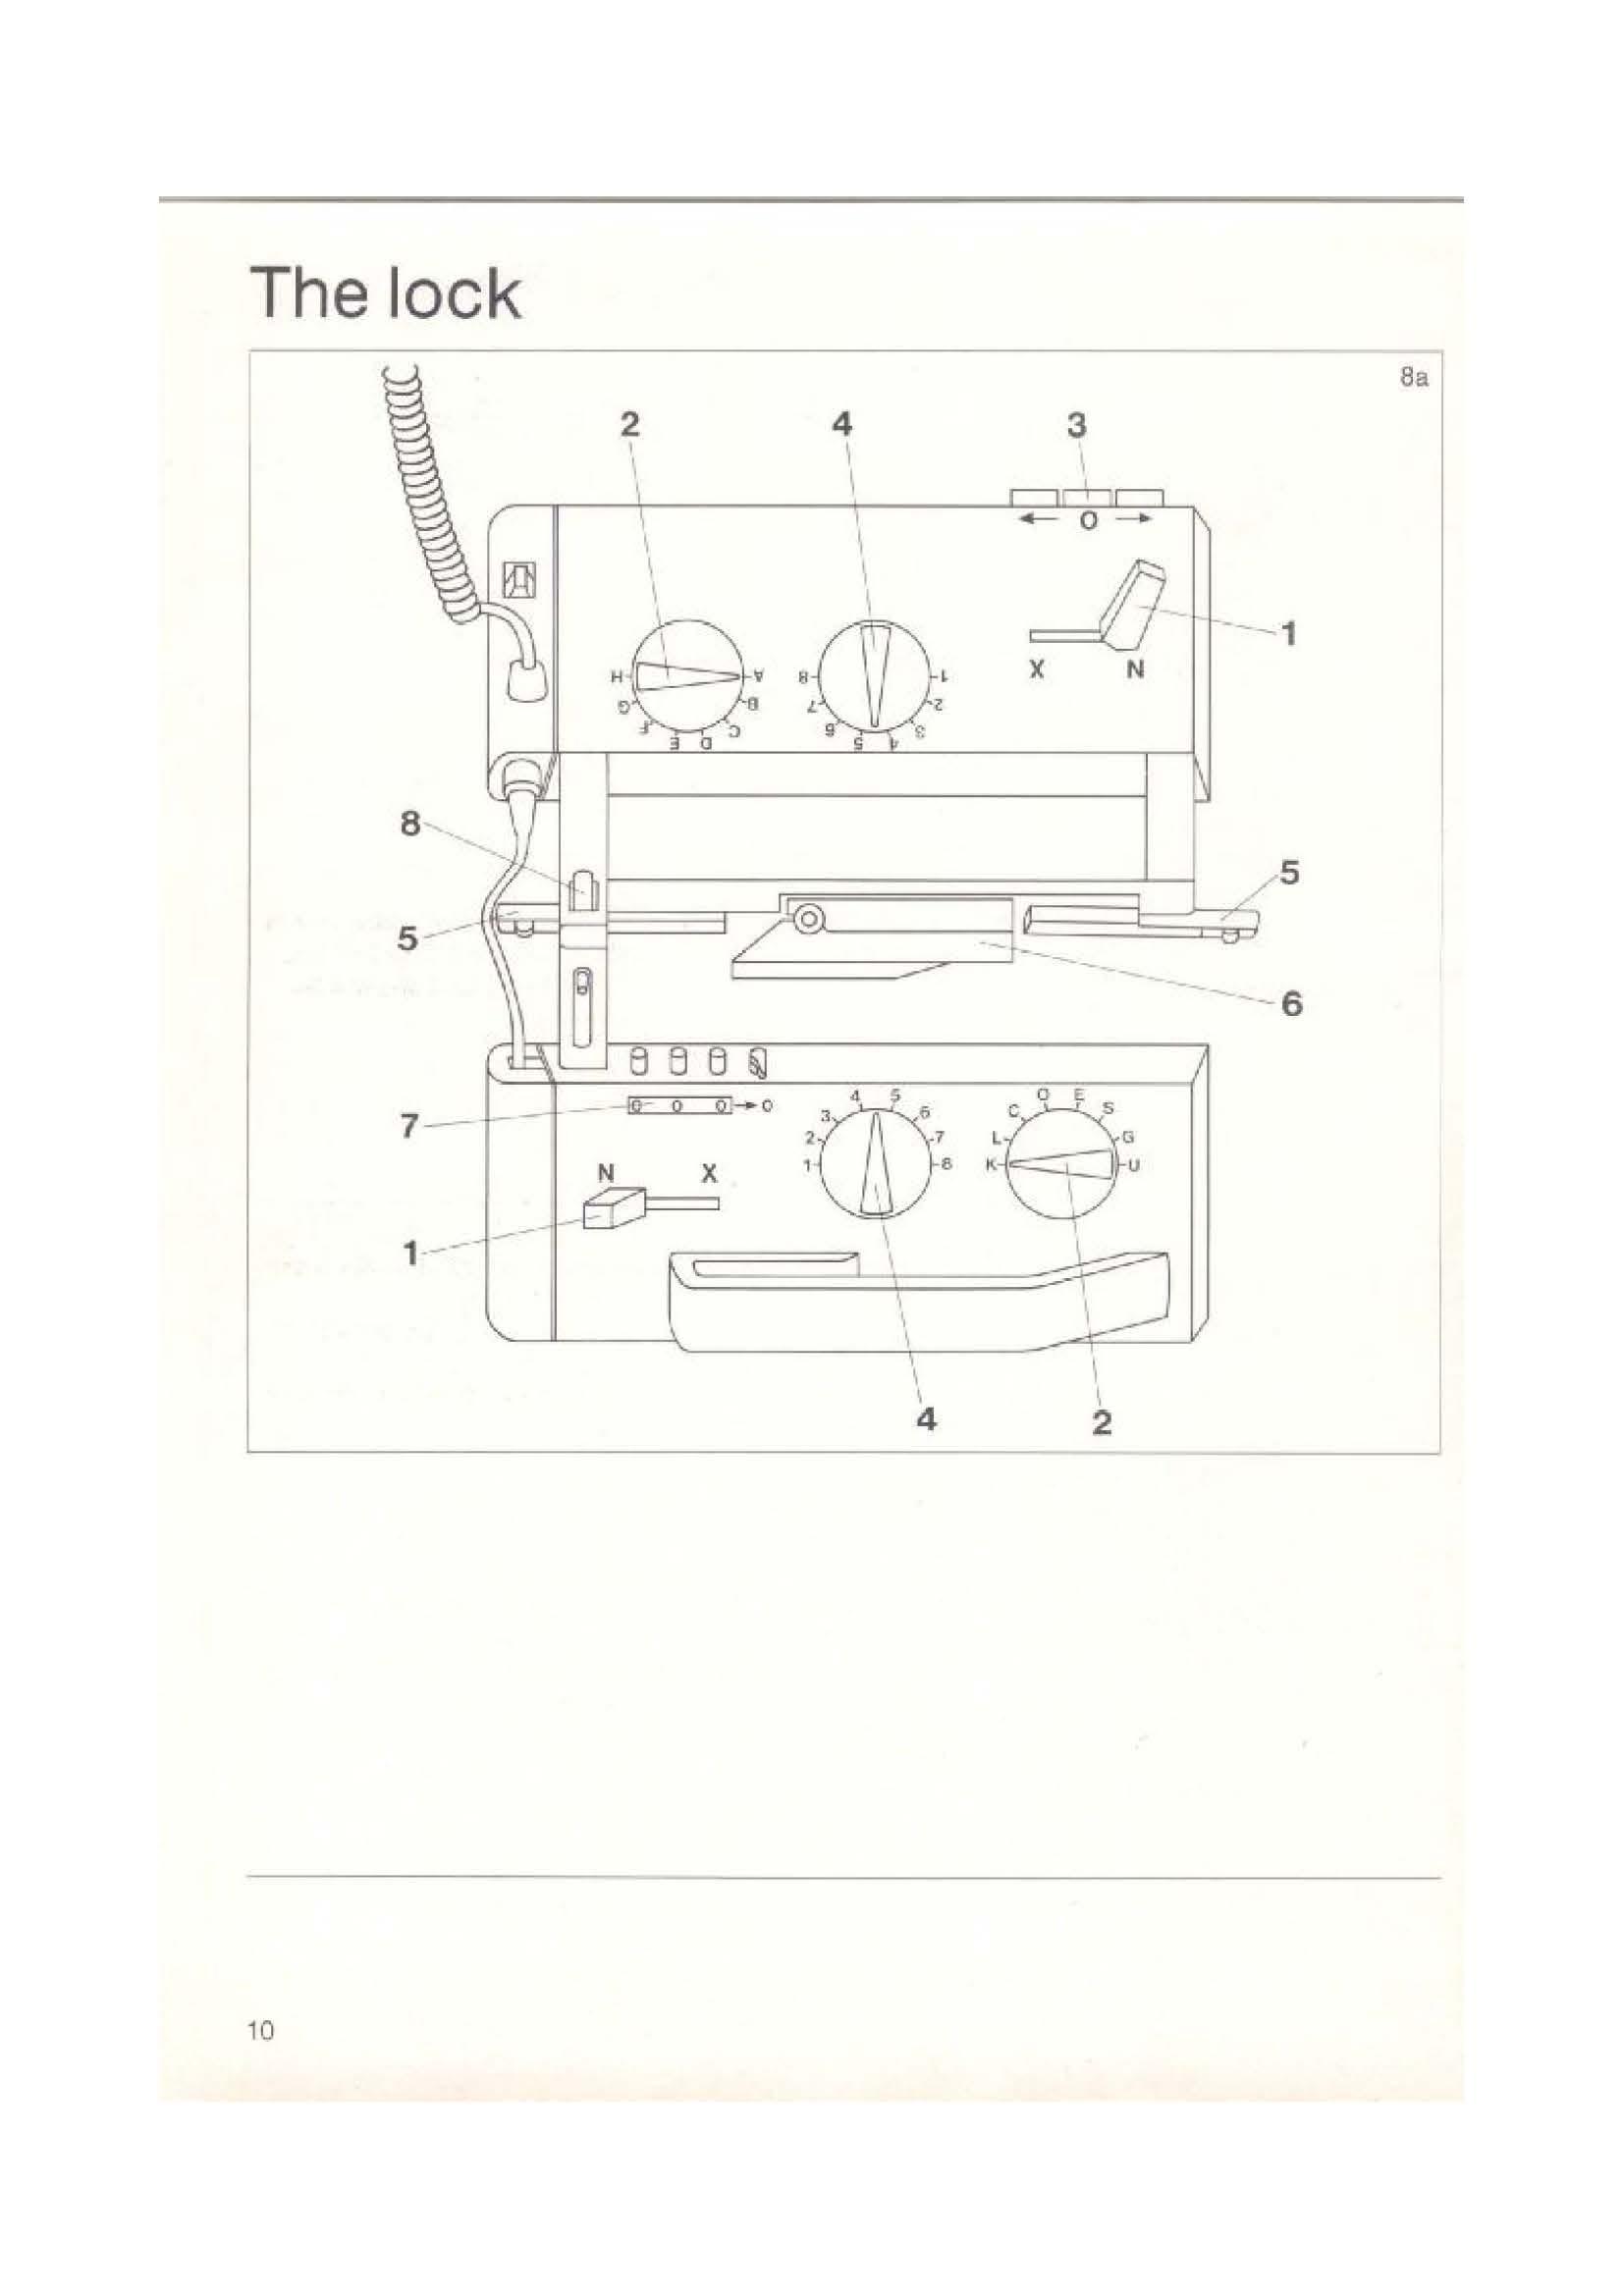 passap_e6000_instruction_manual (100)_Page_011.jpg